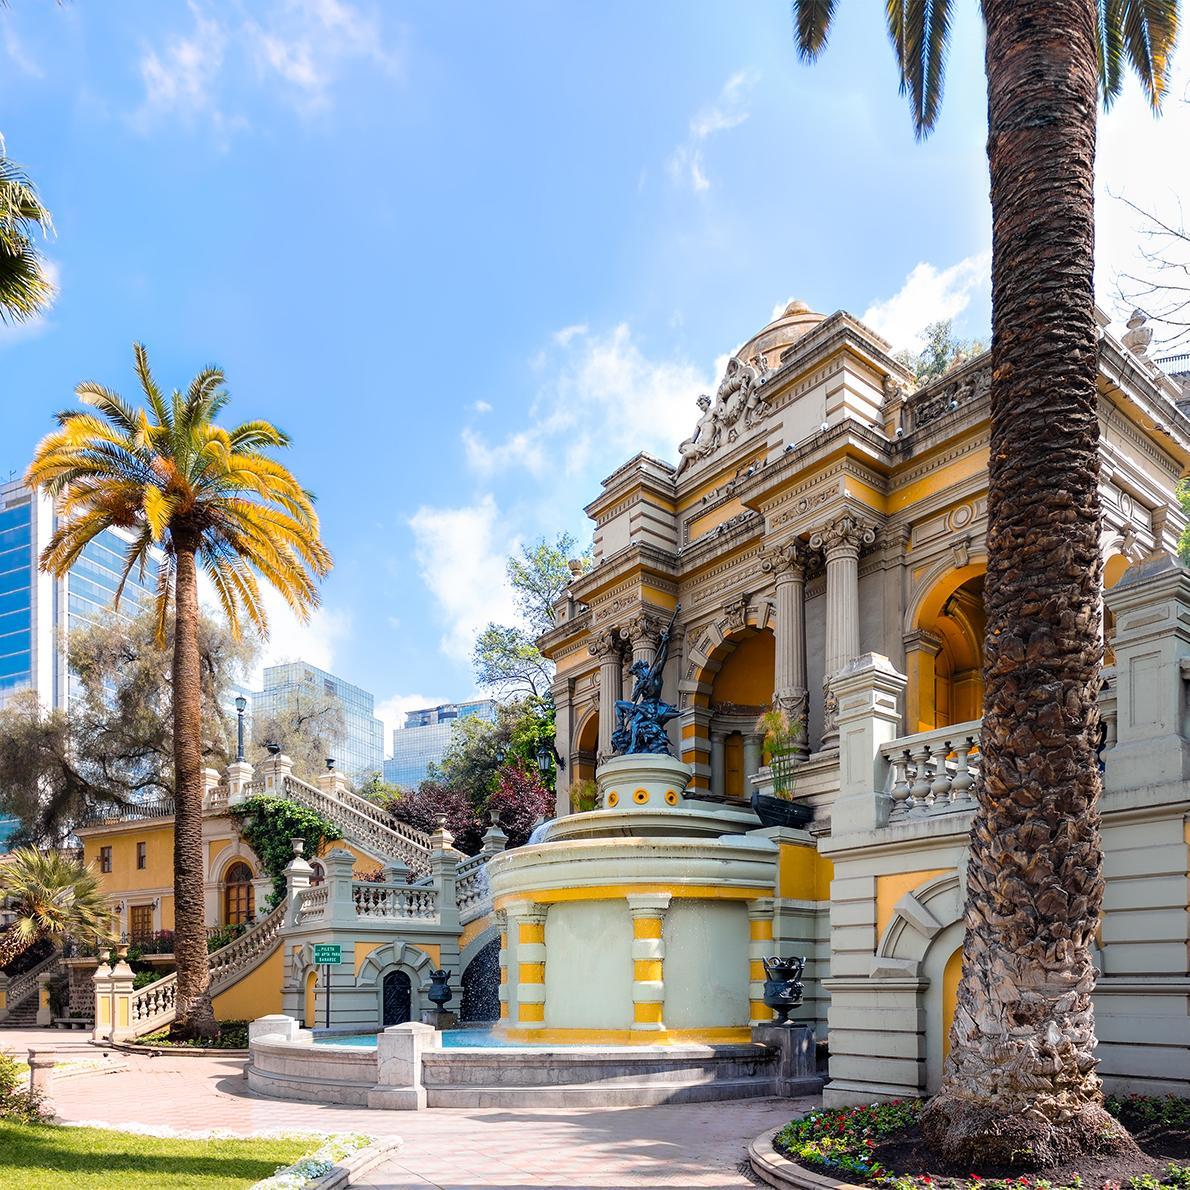 Tour beautiful Chilean architecture with Santiago tours